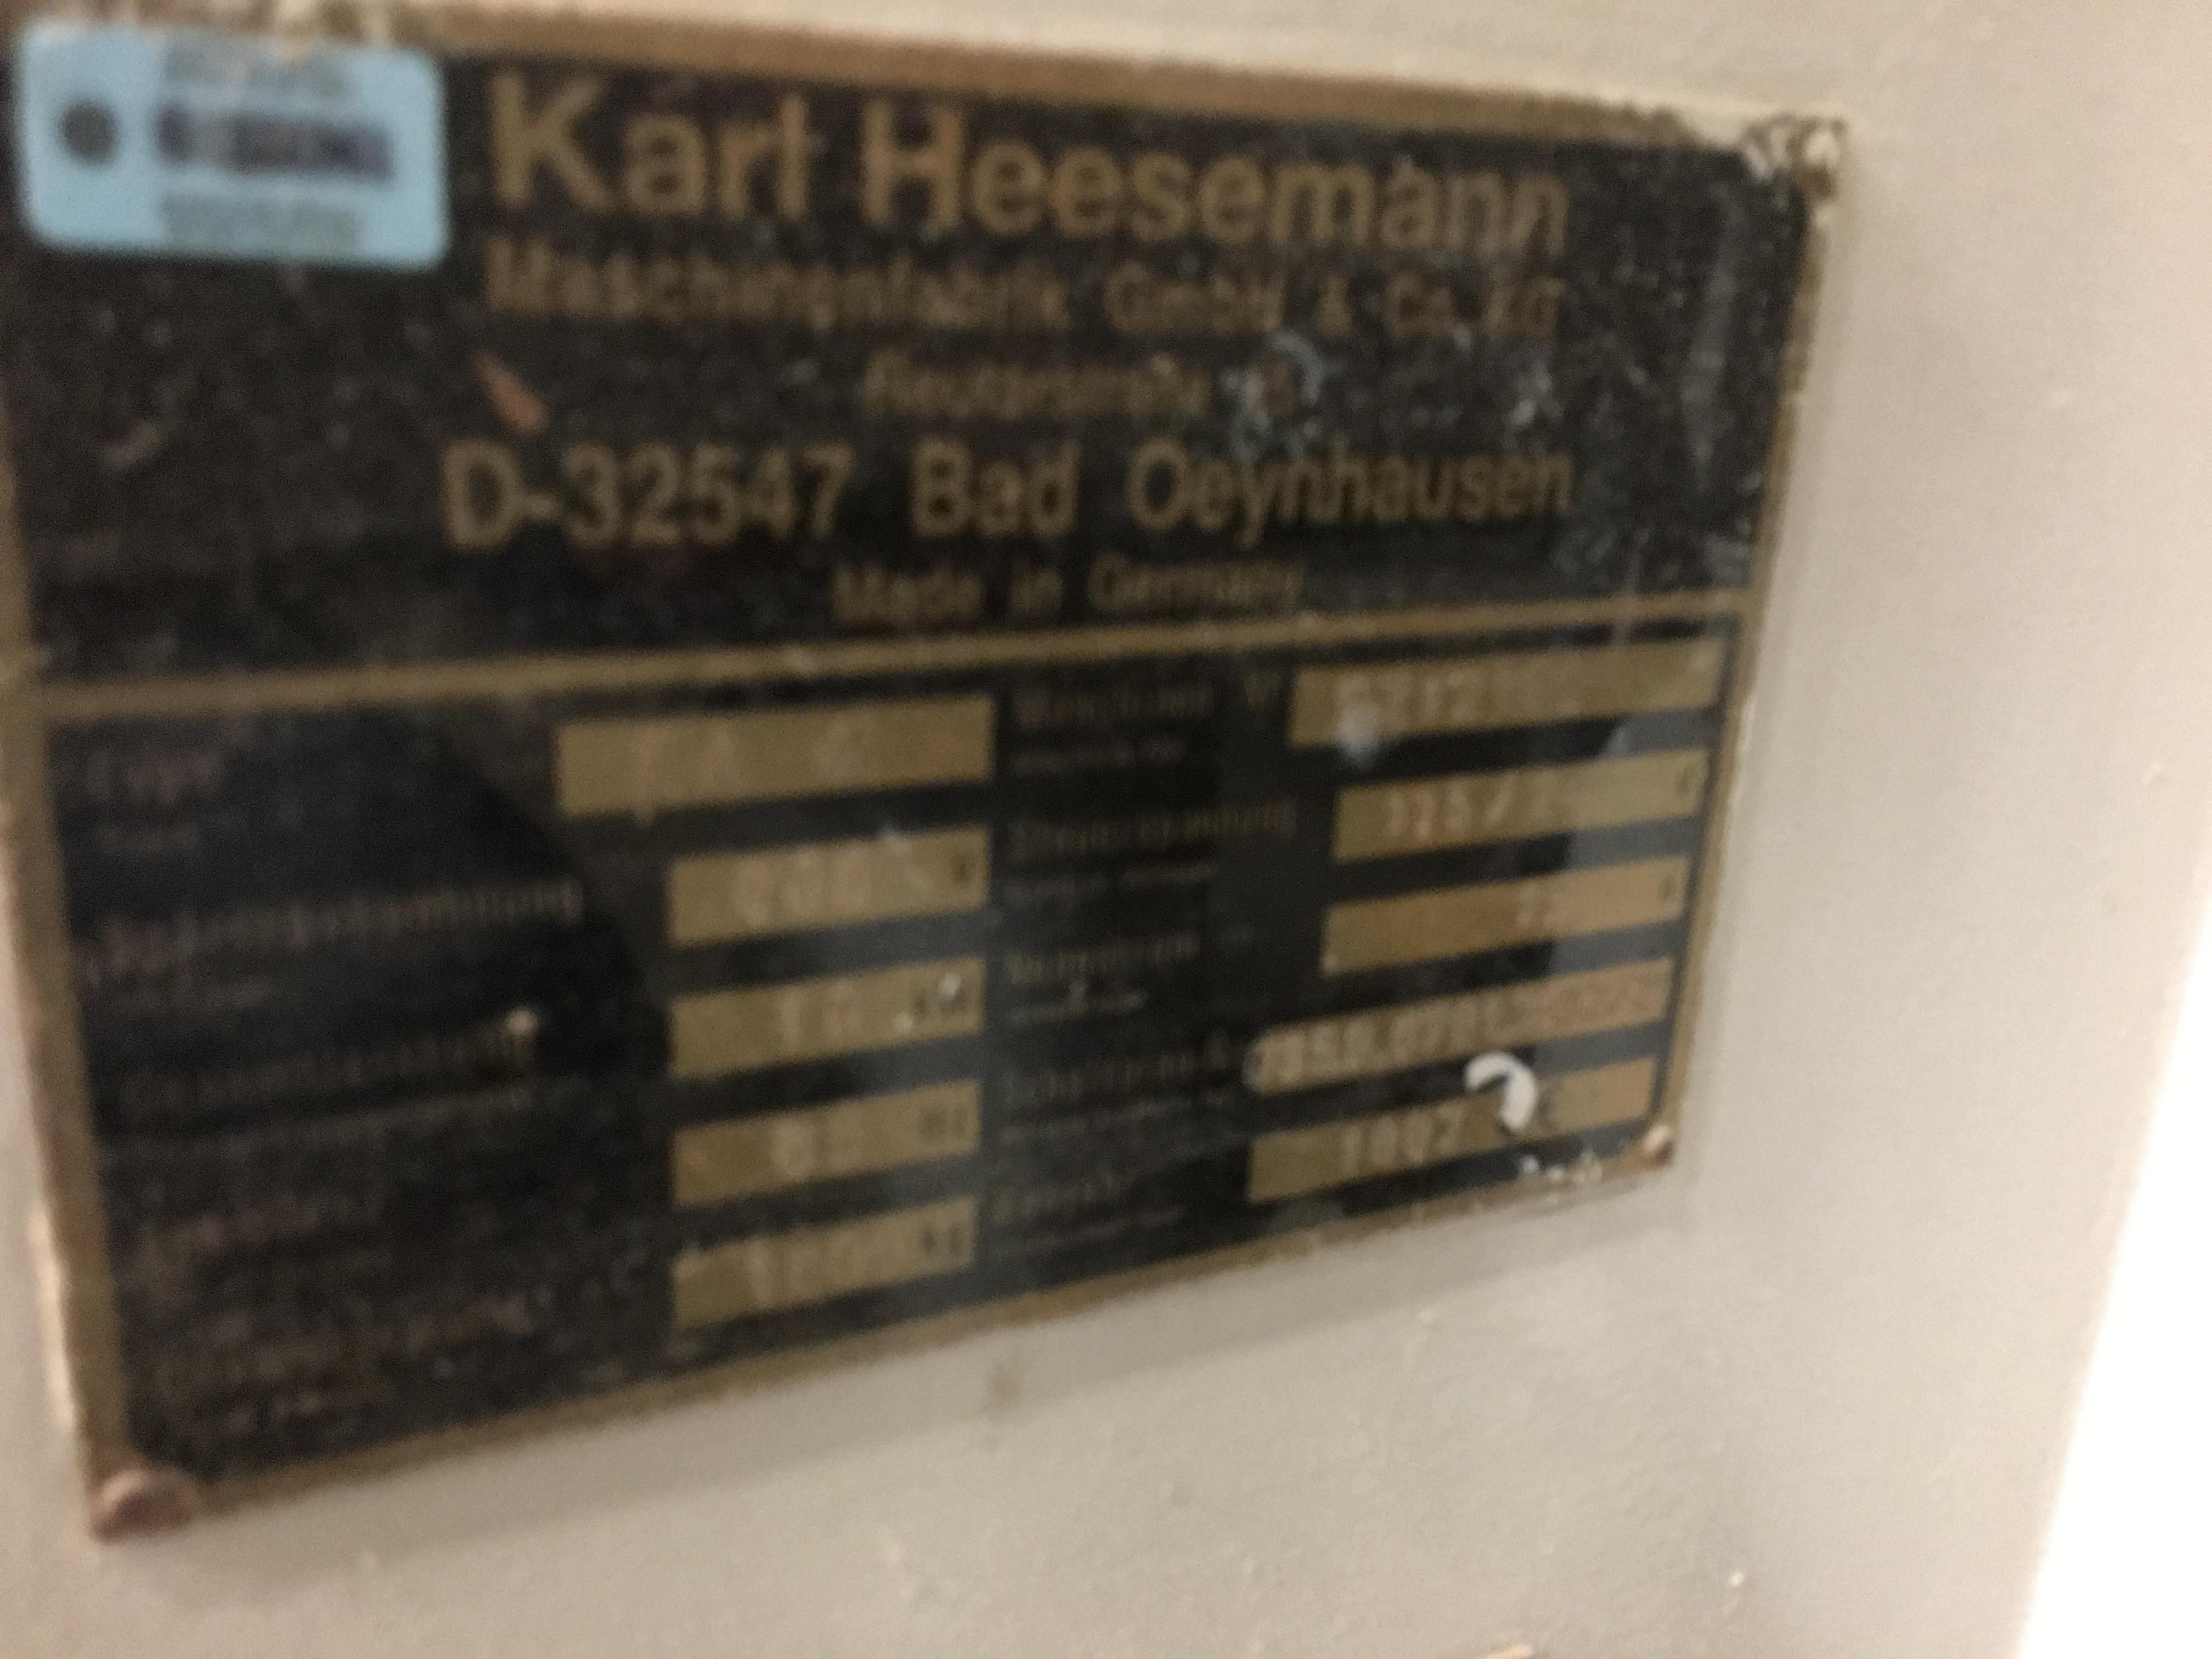 HEESEMANN PANEL CLEANING BRUSH - Image 2 of 5